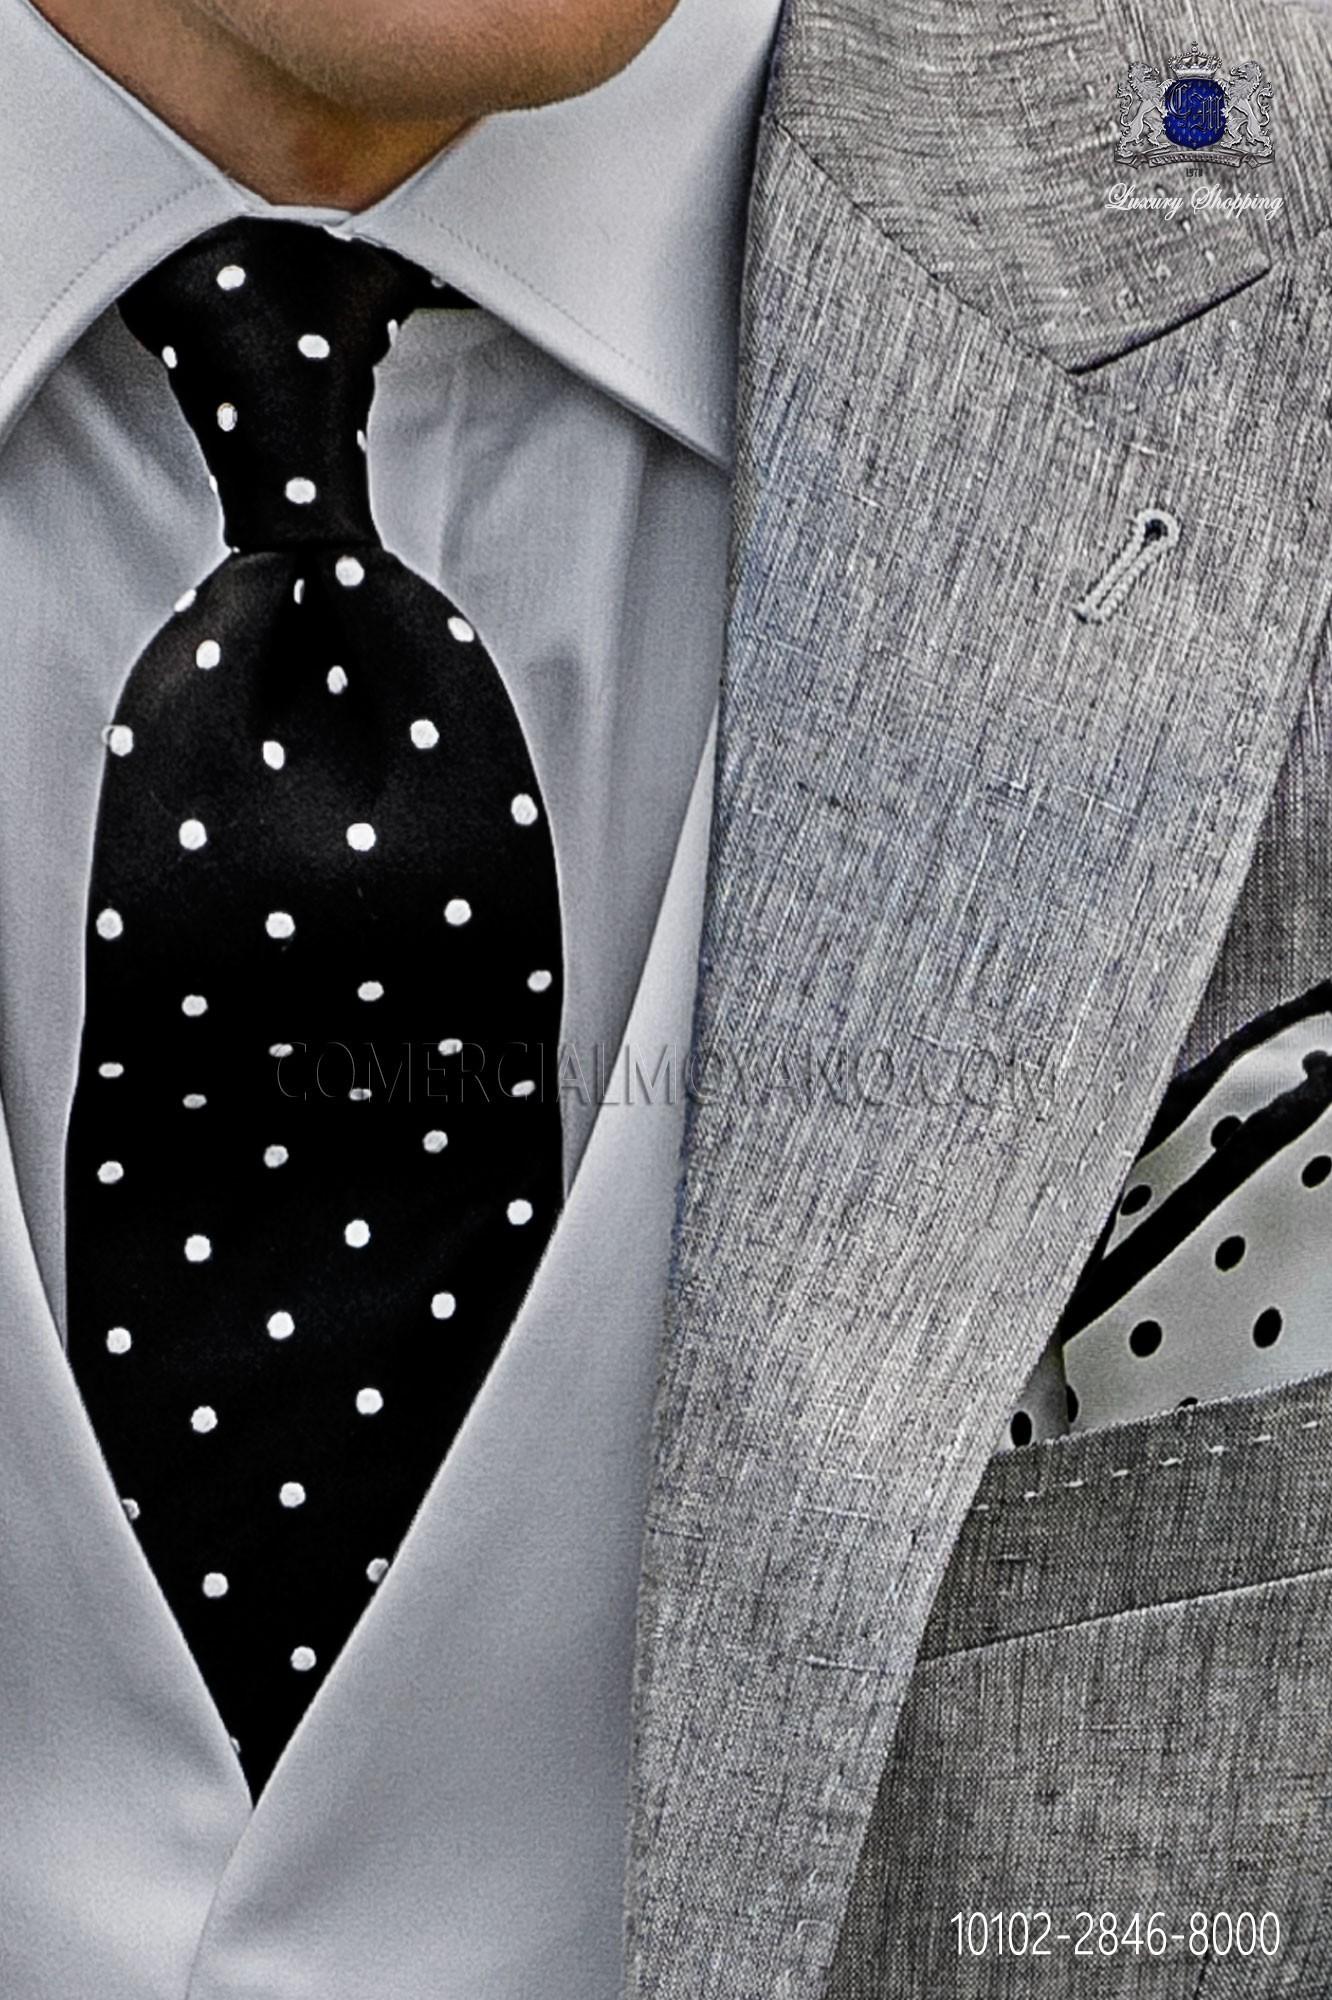 427657394866 100% pure silk tie with black polka dots Ottavio Nuccio Gala